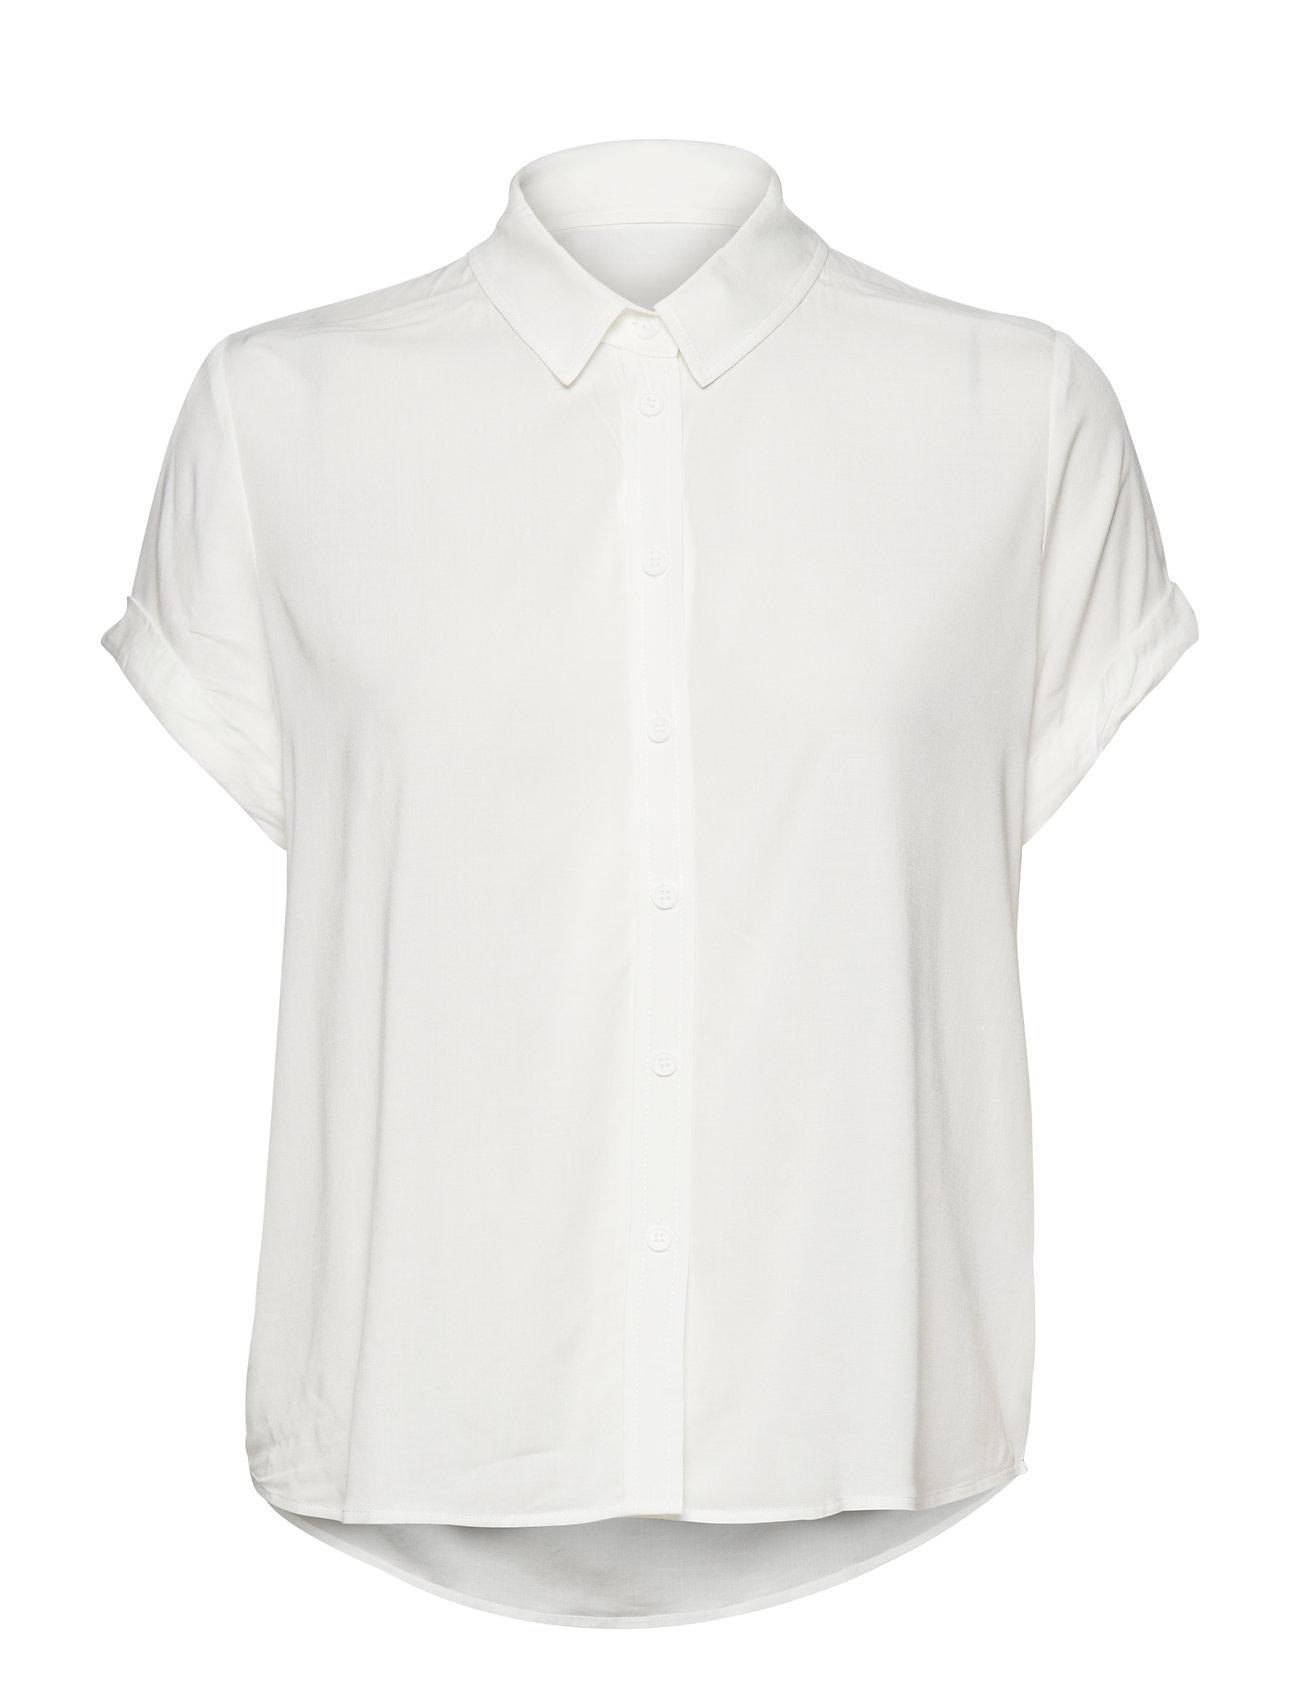 Samsøe & Samsøe Majan ss shirt 9942